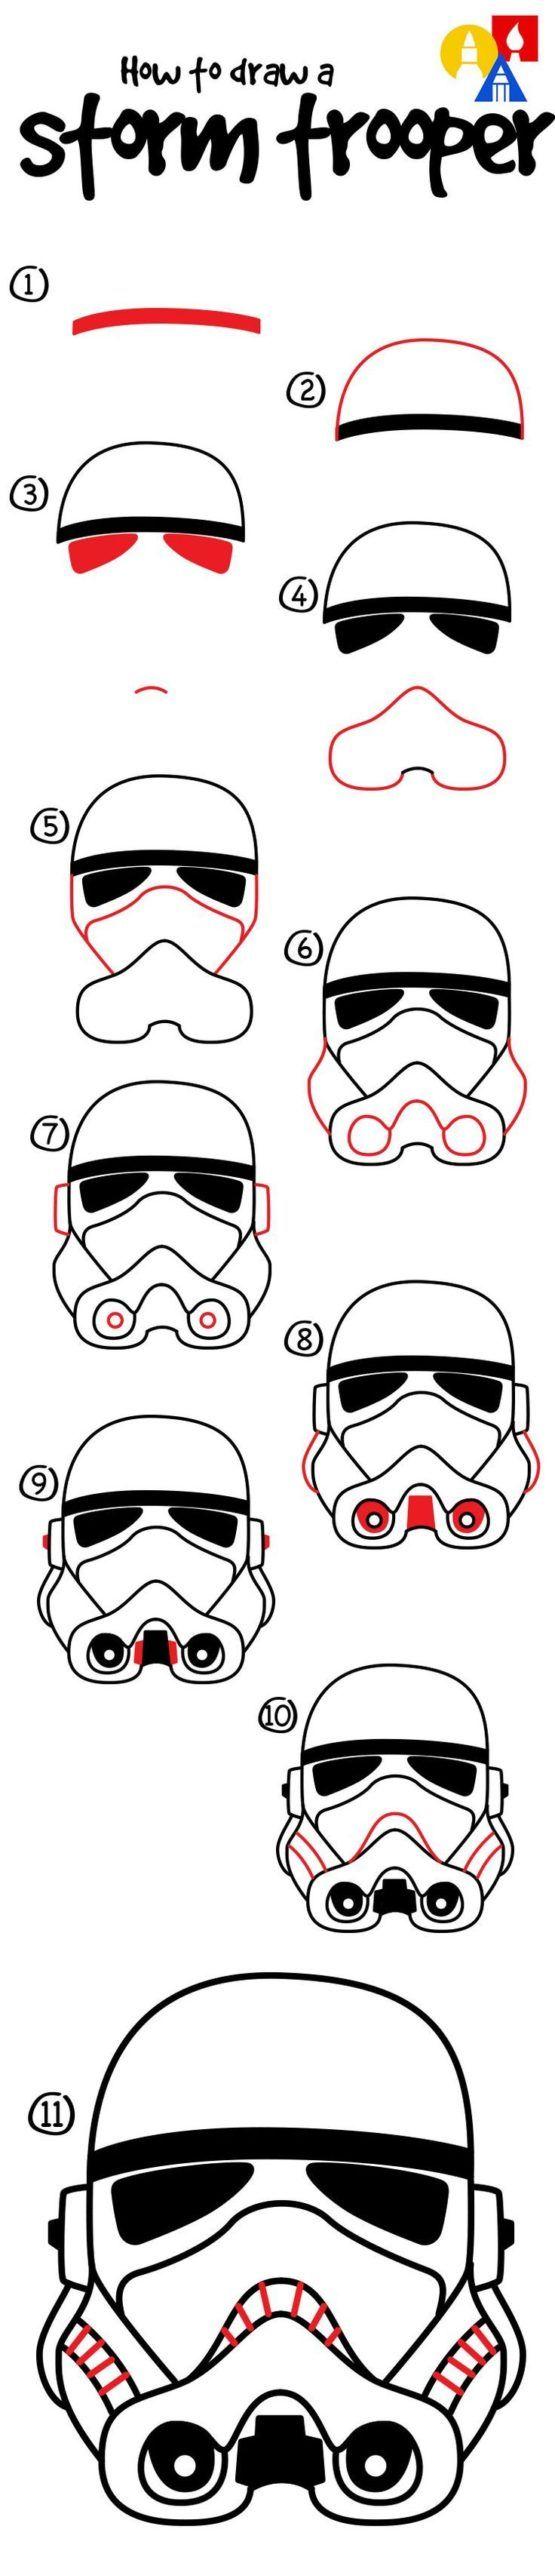 How To Draw A Stormtrooper Helmet - Art For Kids Hub - - # ...